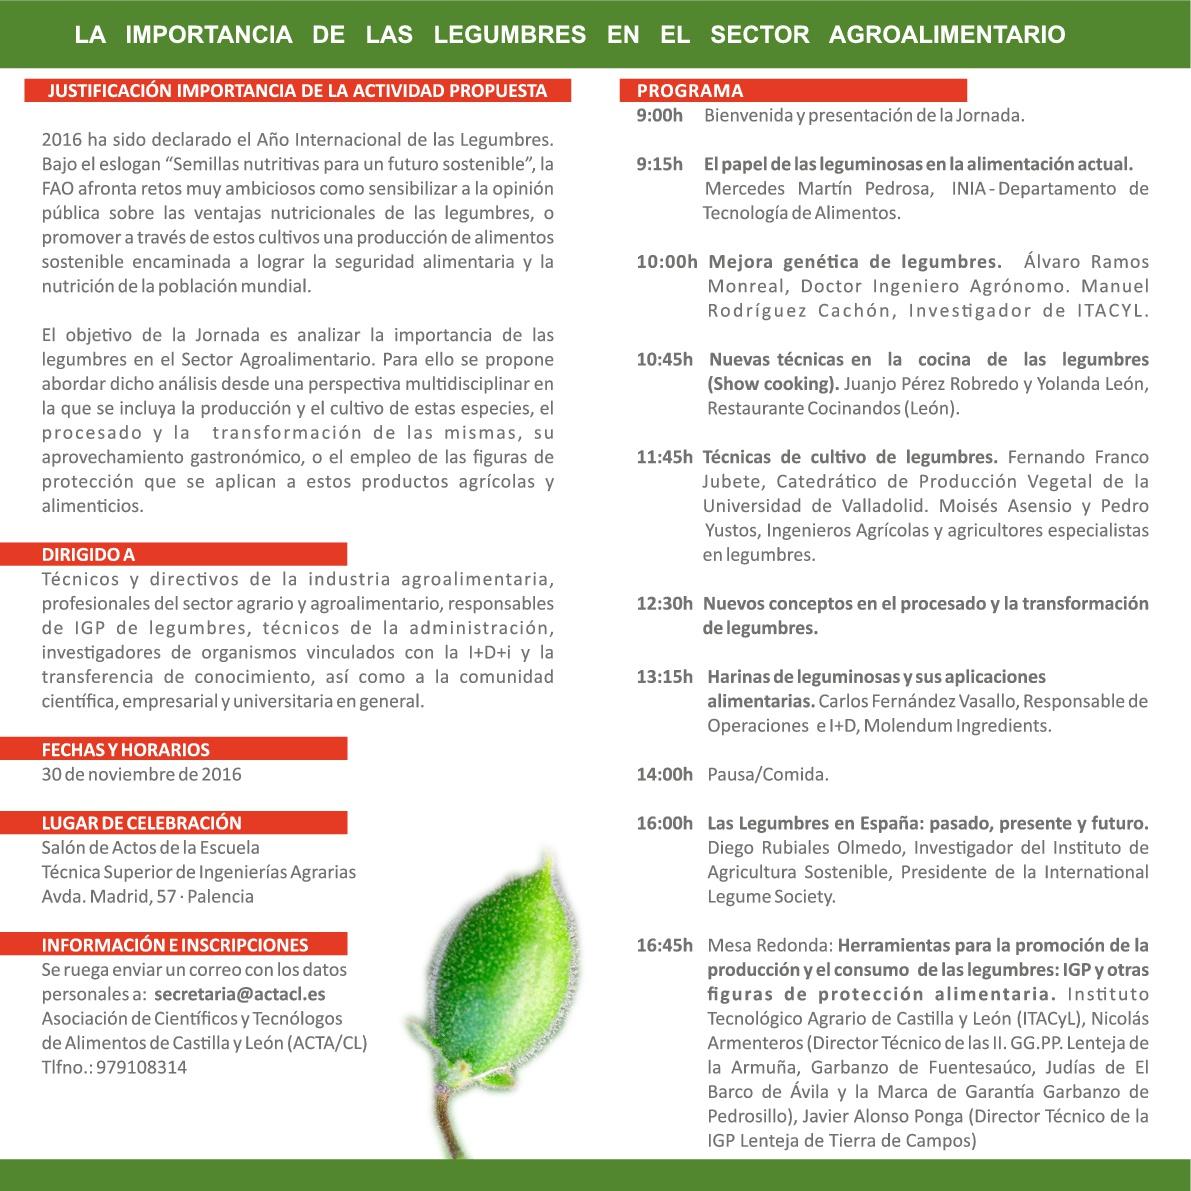 jornada-leguminosas-palencia-2016-002